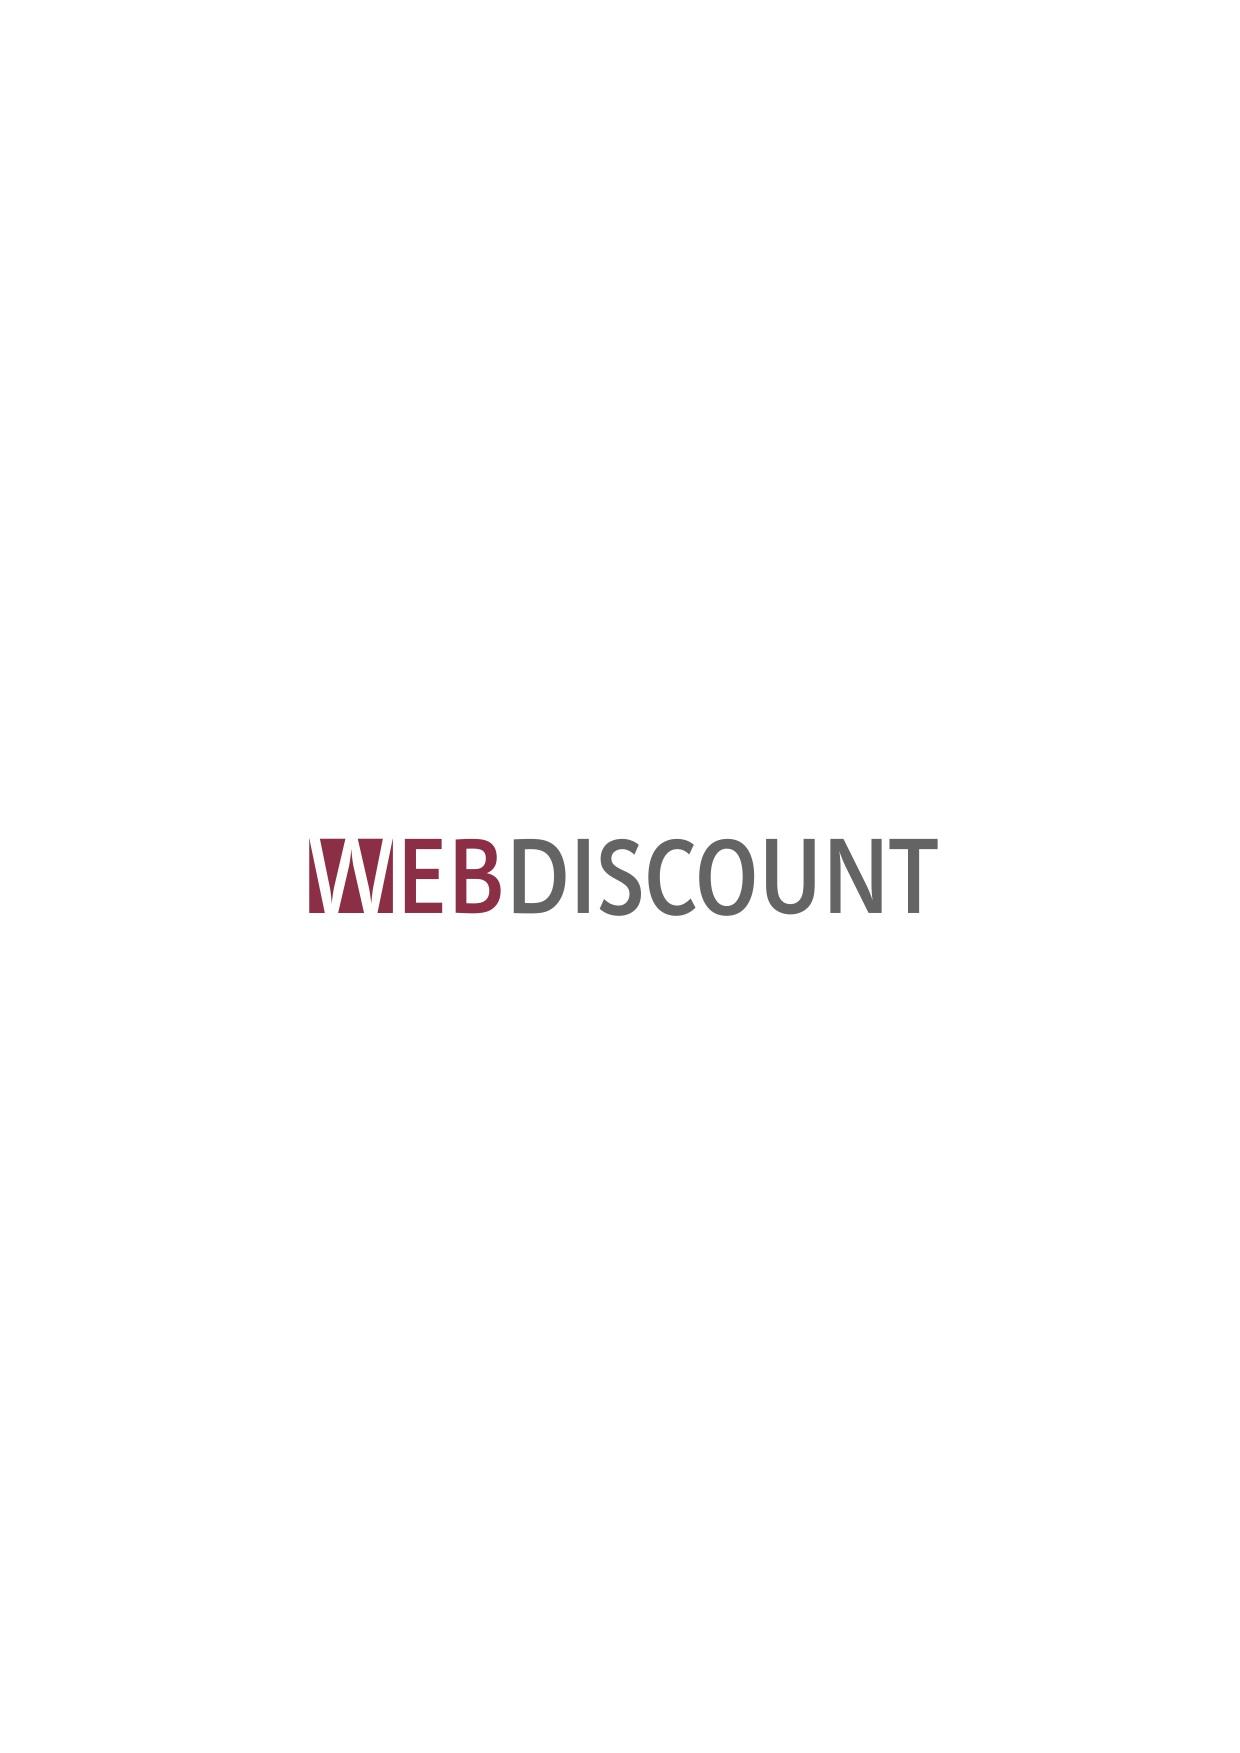 Webdiscount GmbH & Co. KG